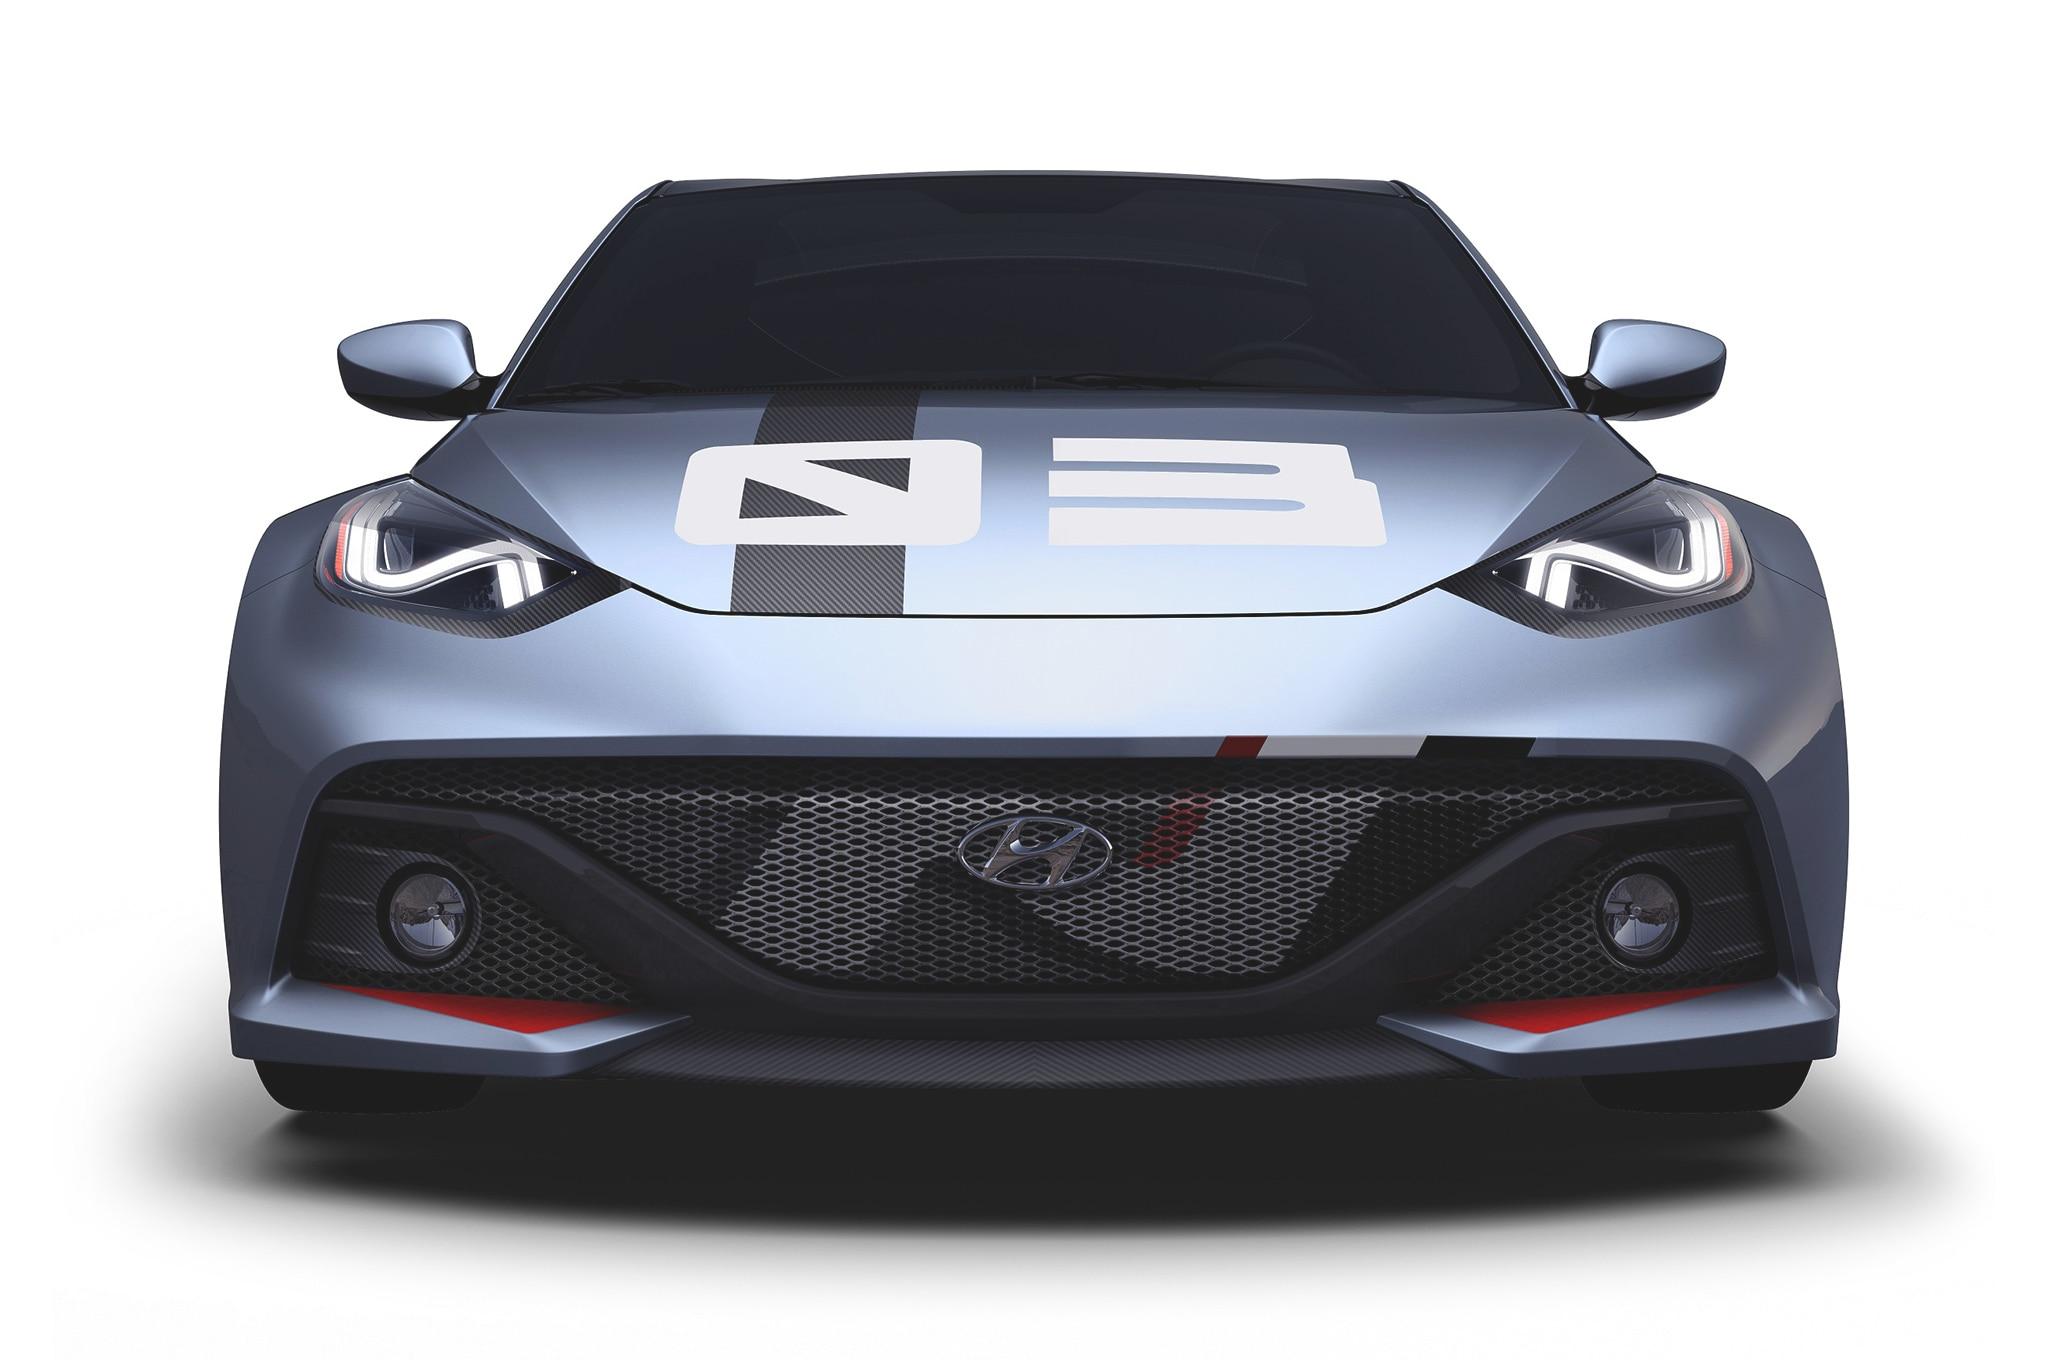 Hyundai Rm16 >> Hyundai RM16 N Concept, 2017 Genesis G80 Sport Revealed | Automobile Magazine